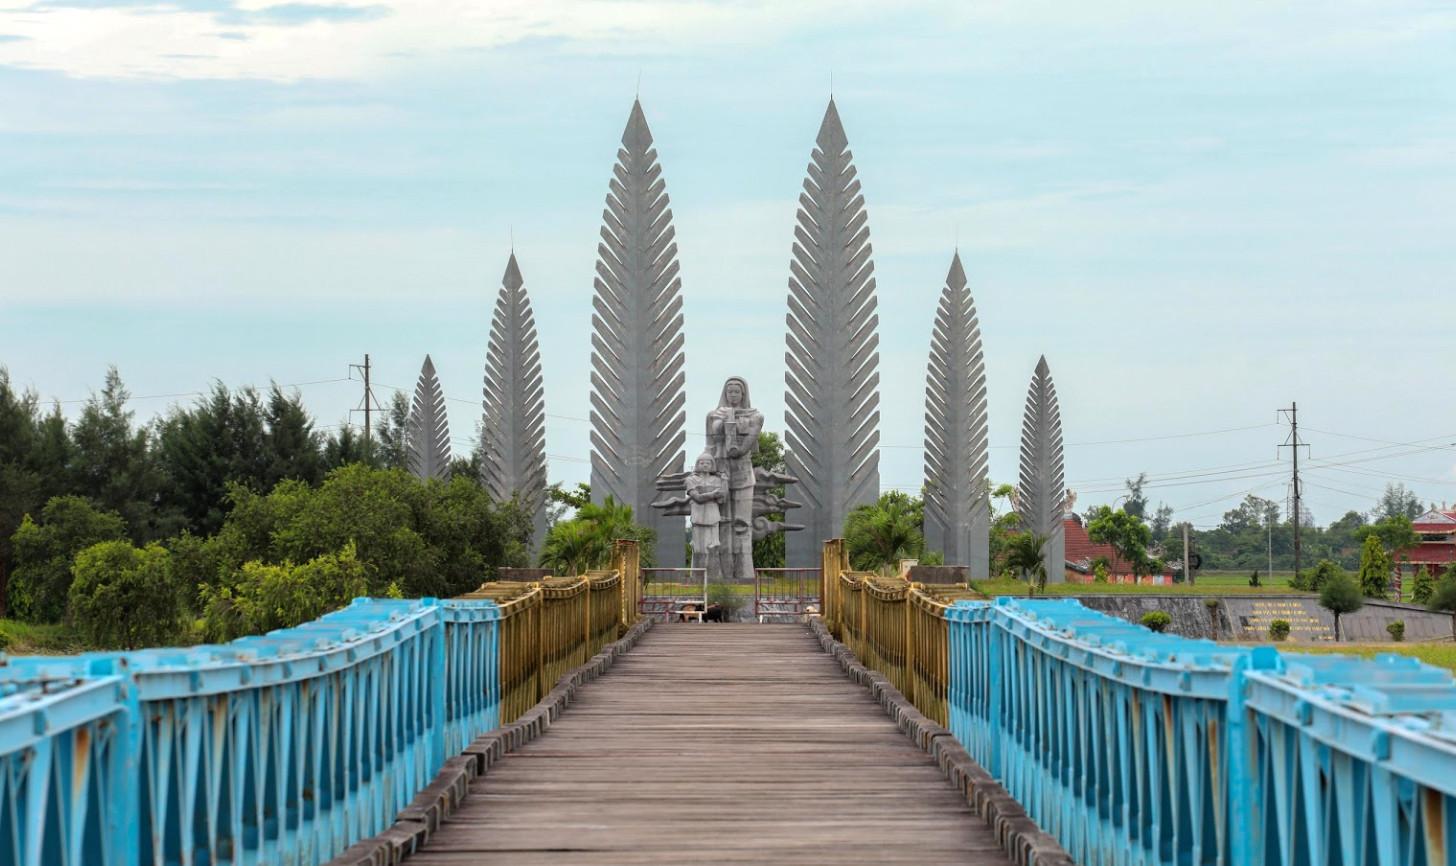 quang-tri-hien-luong-bridge-ben-hai-river